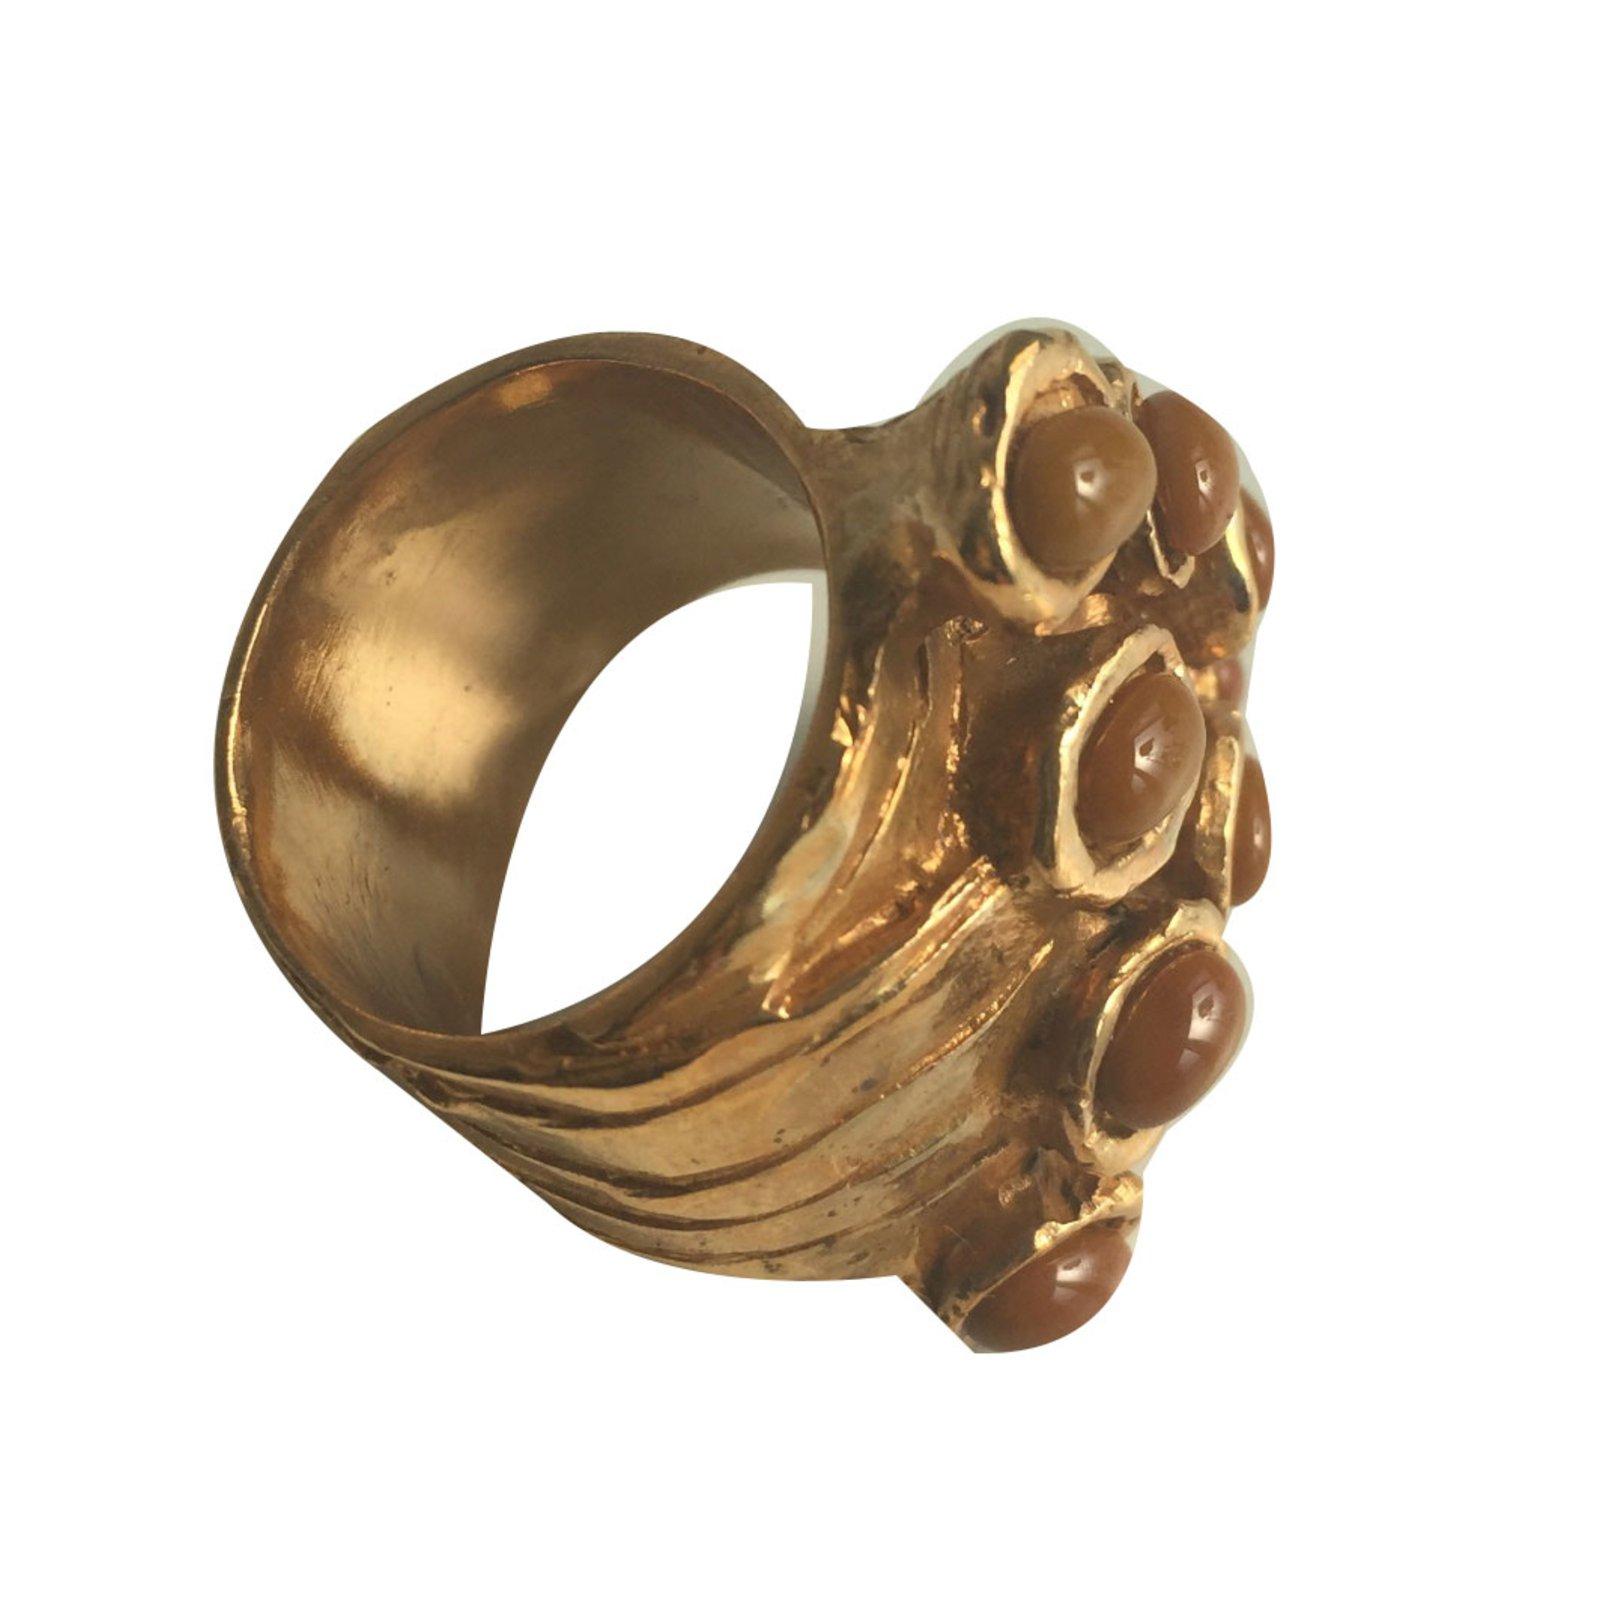 f134ccbd29b9 Yves saint laurent arty rings metal orange ref joli closet jpg 1600x1600  People with ysl arty